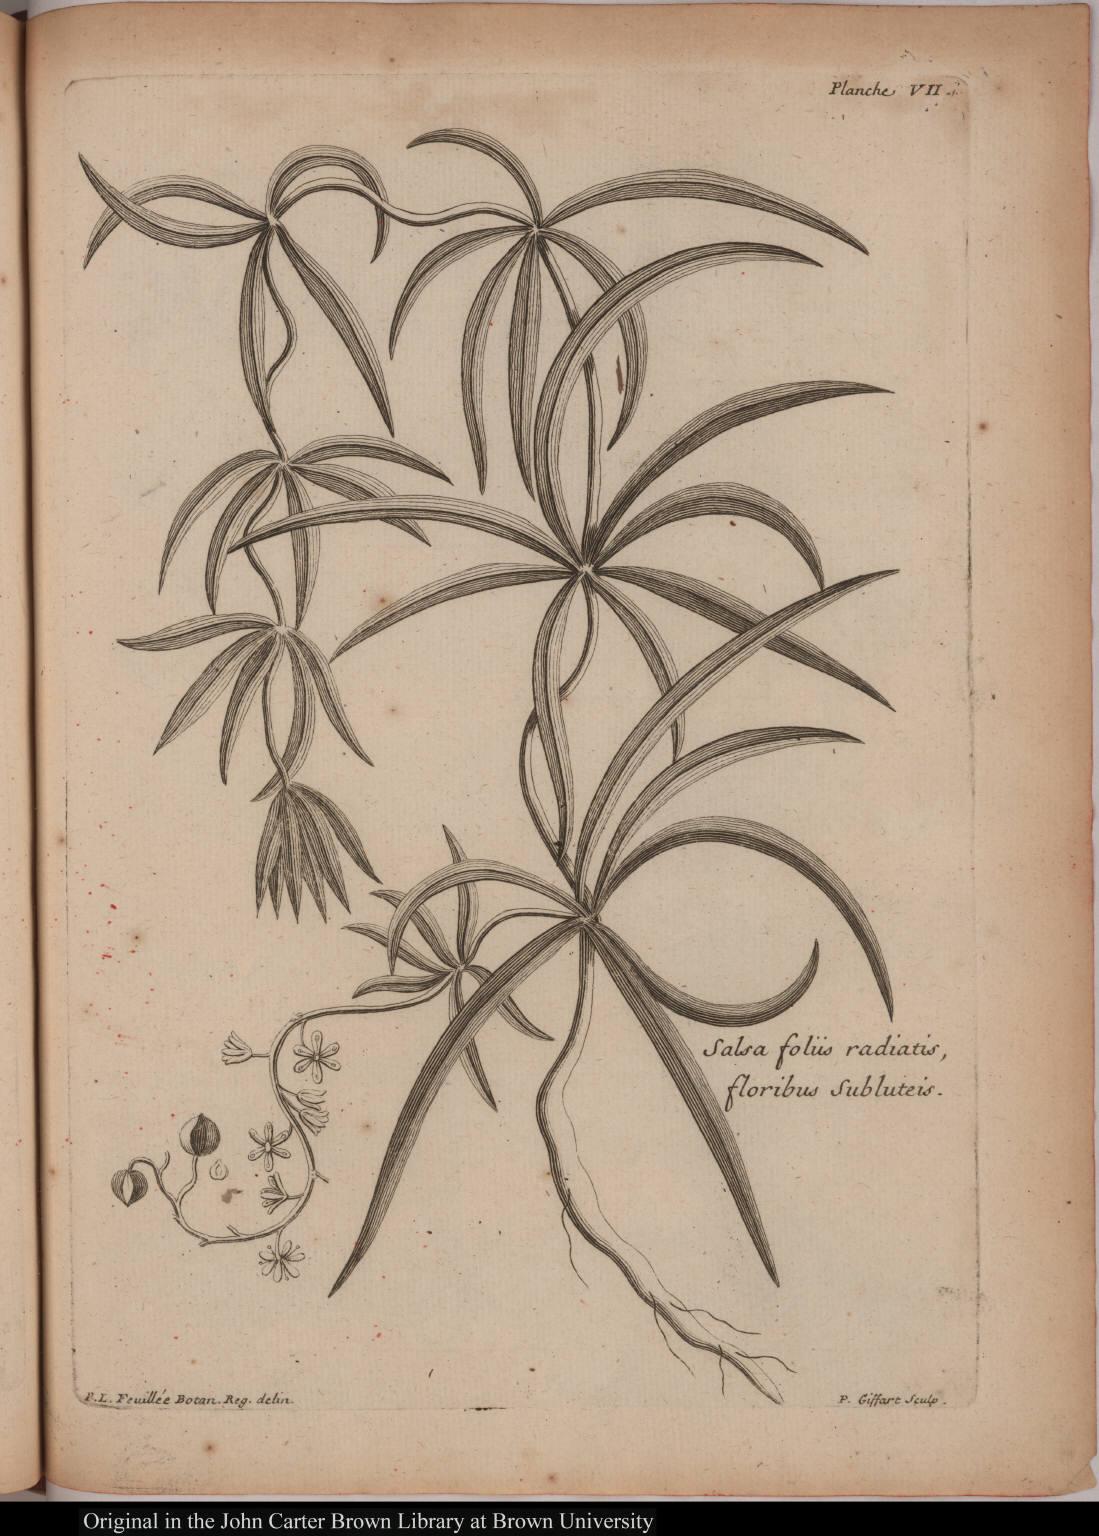 Salsa foliis radiatis, floribus subluteis.